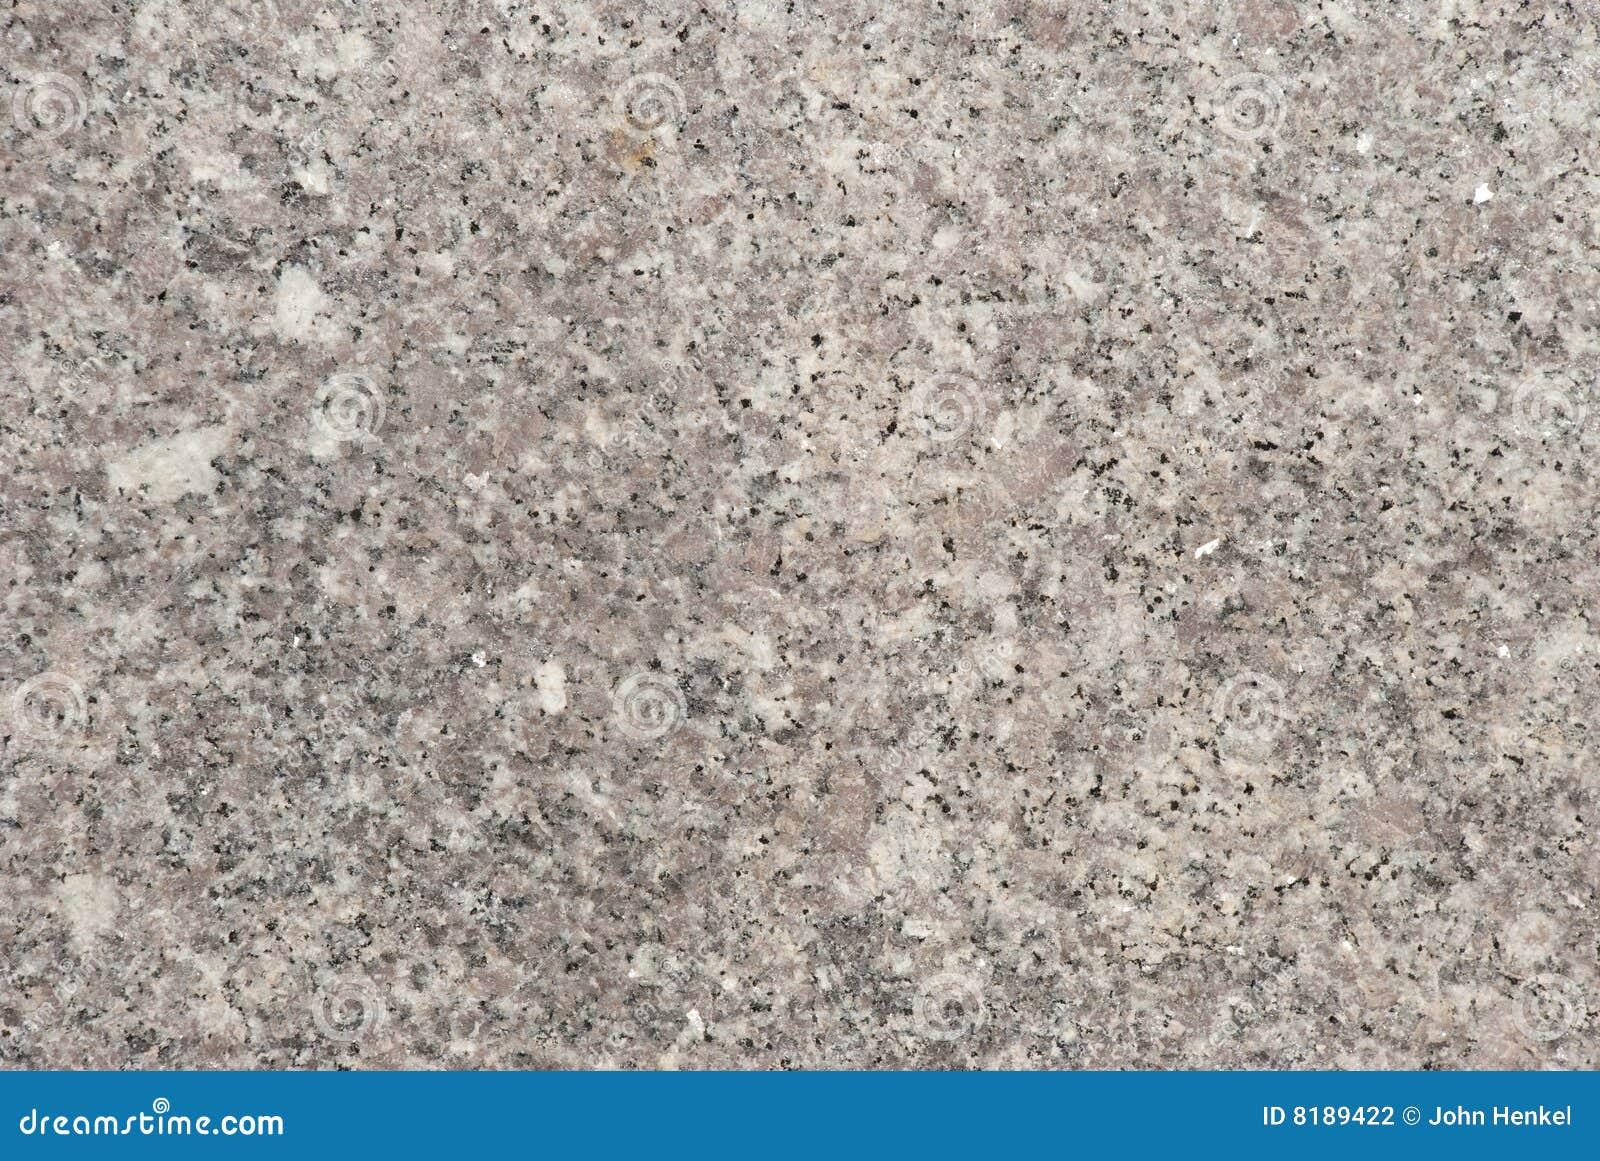 Fond en pierre gris de granit